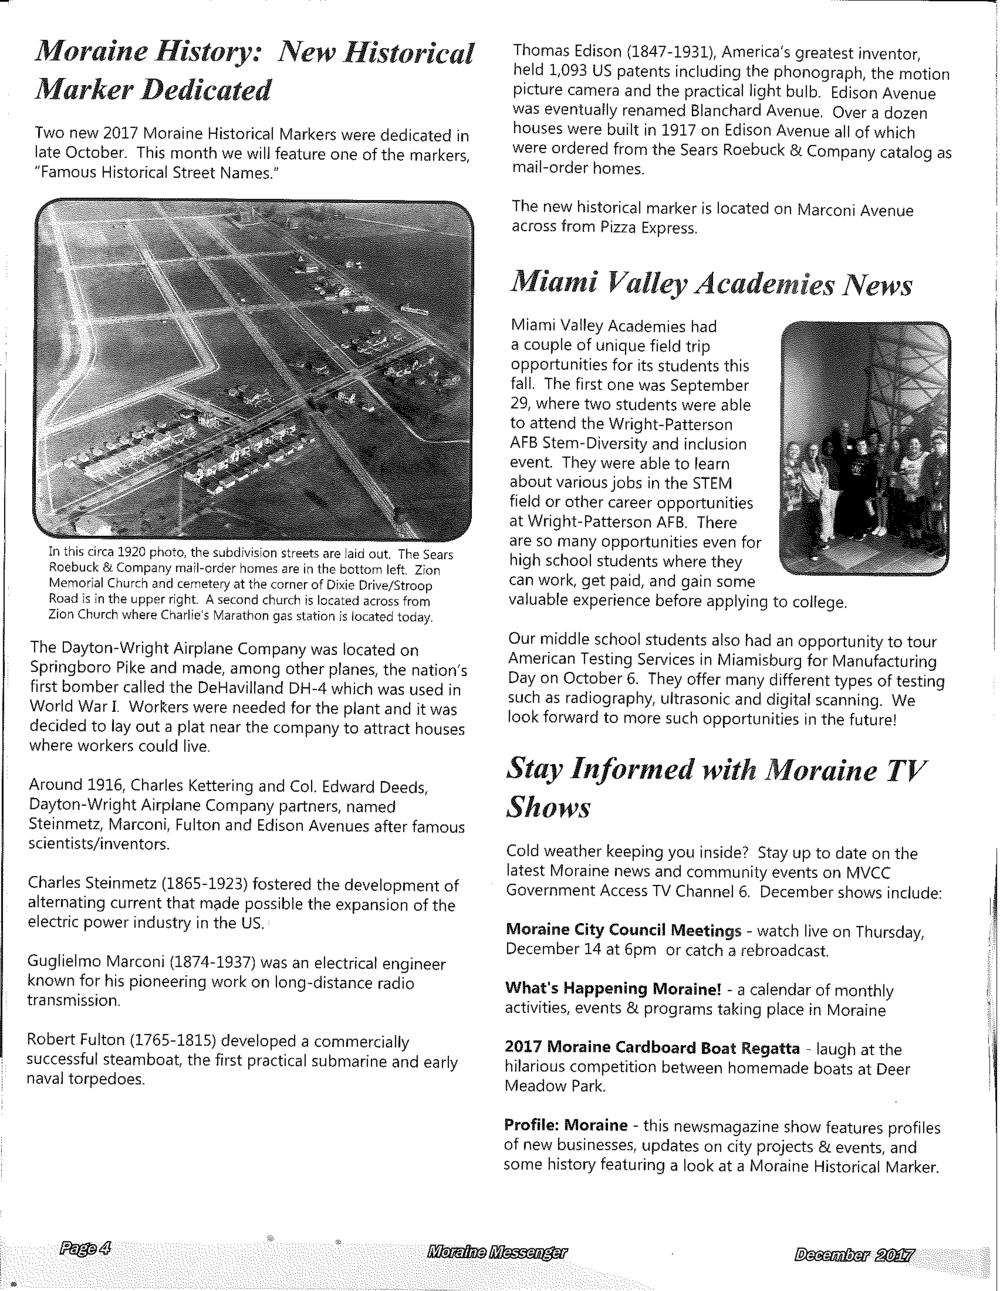 News — Miami Valley Academies